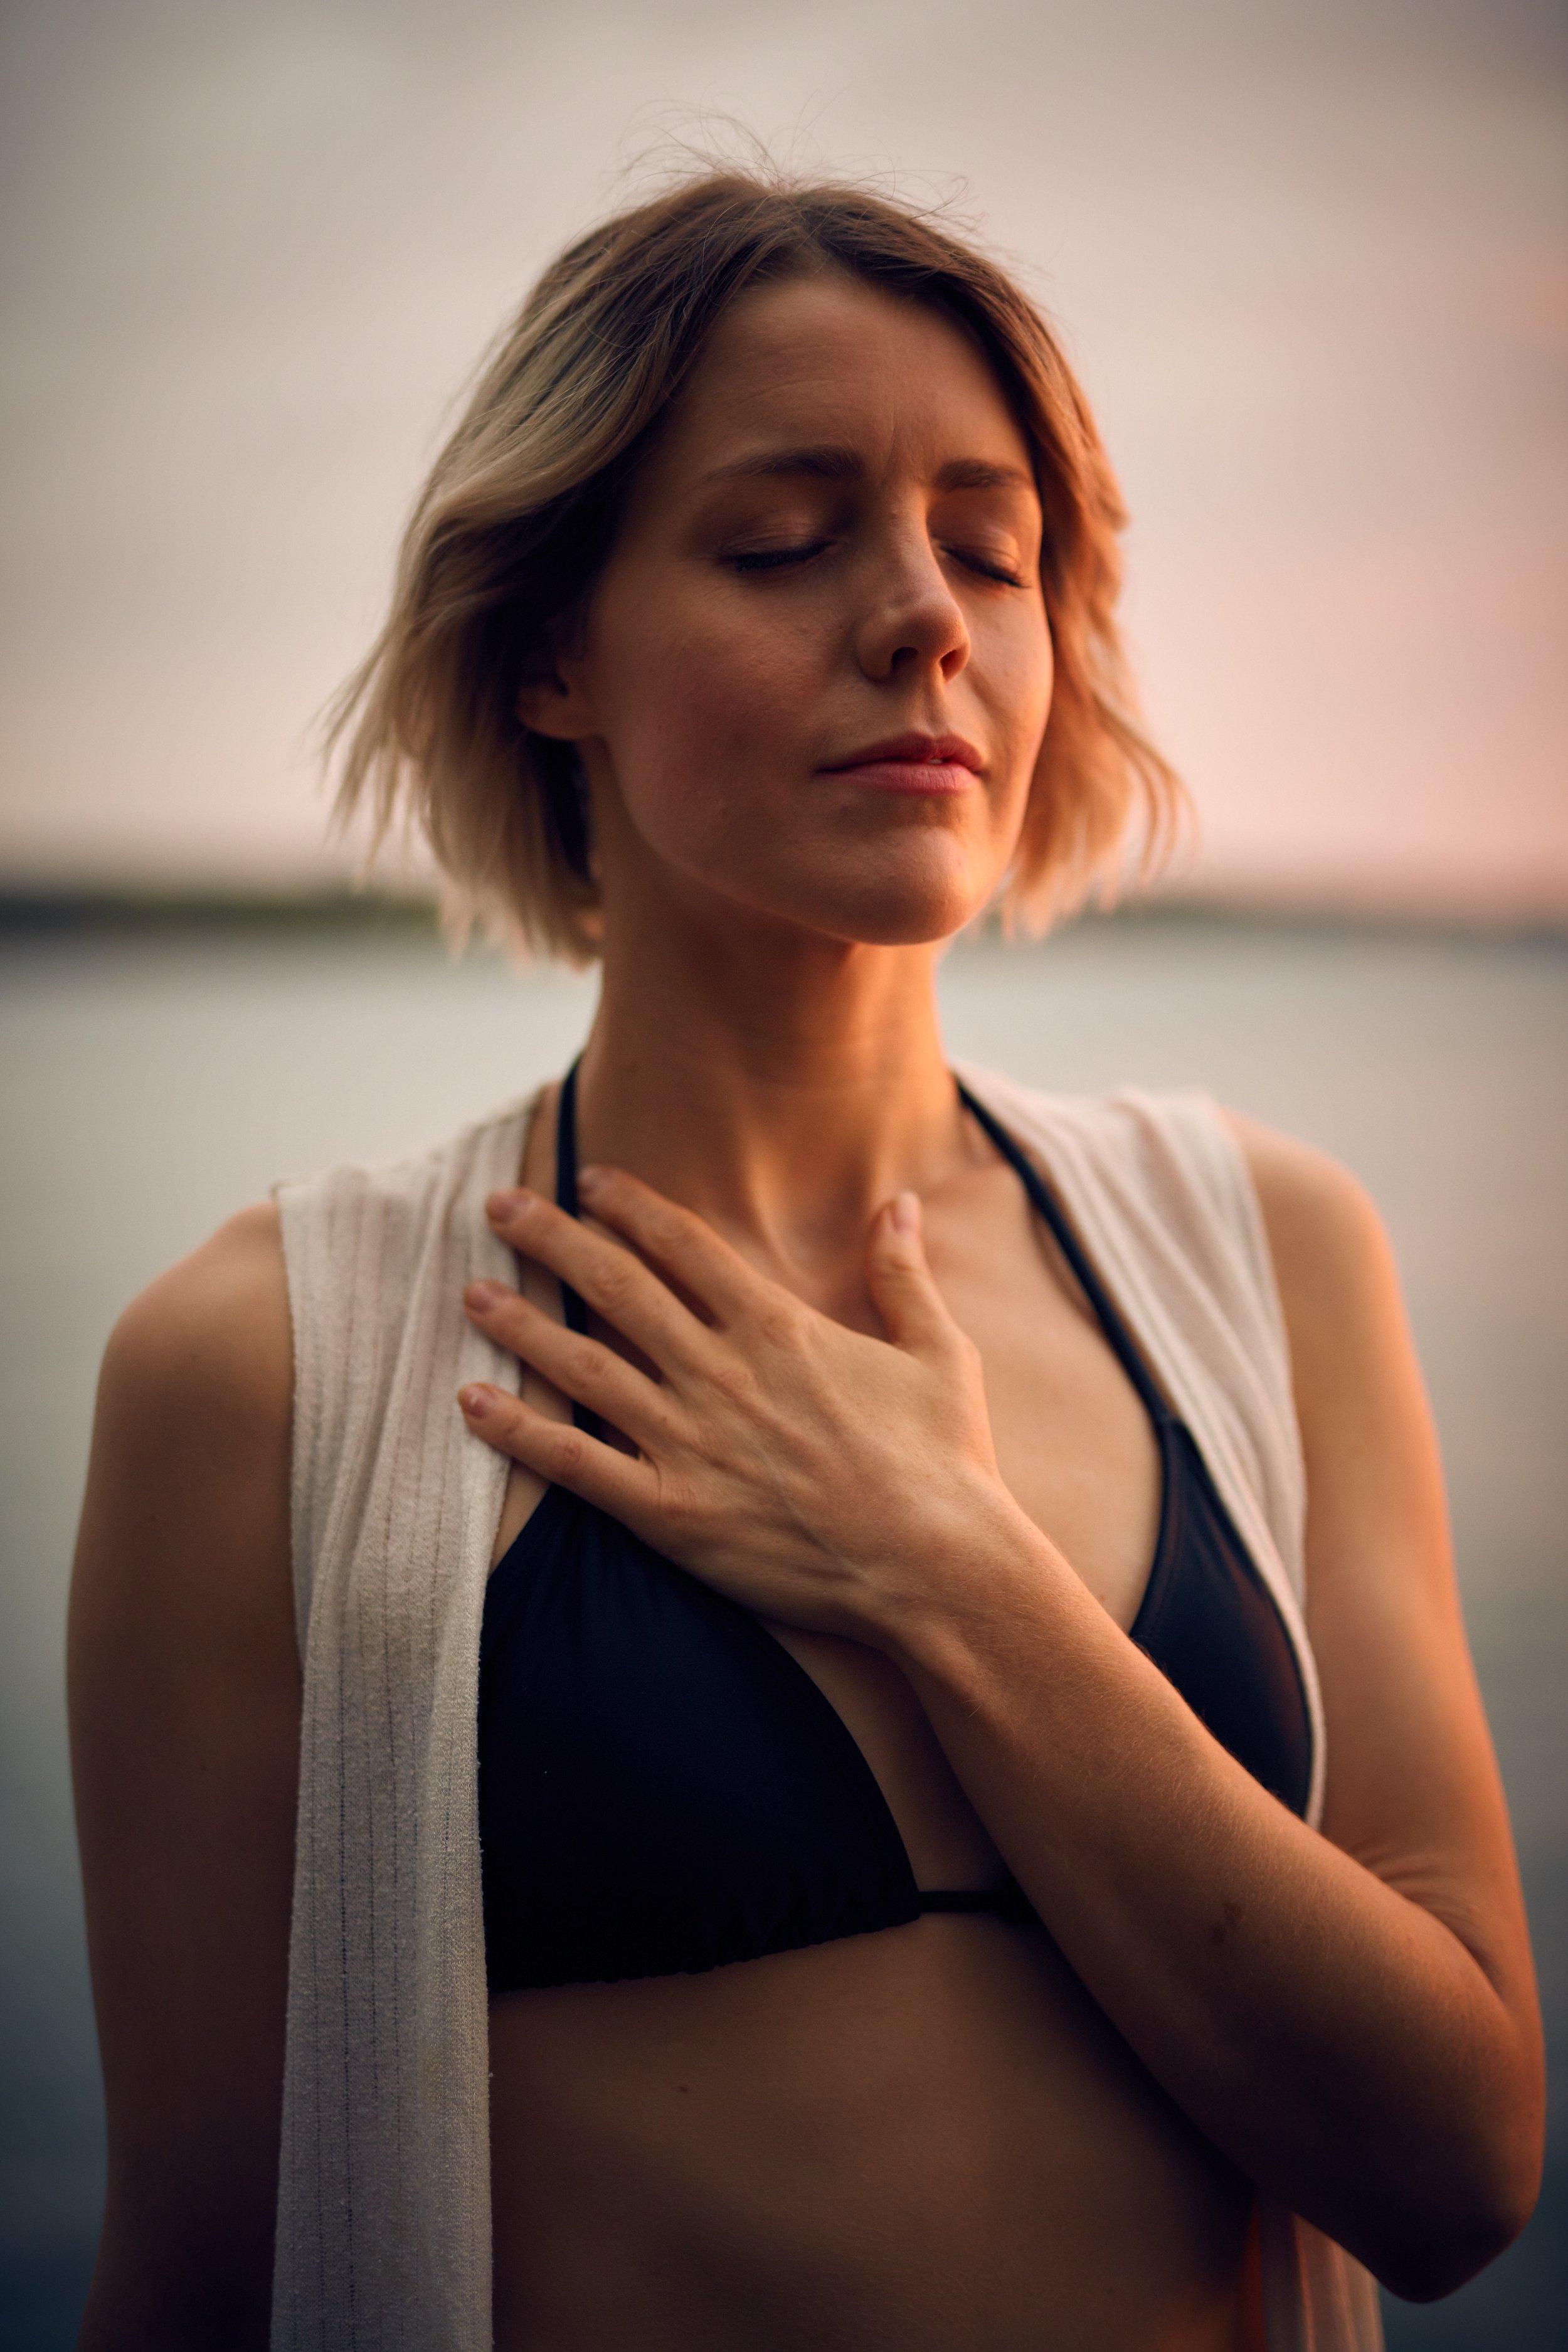 breast massage.jpg